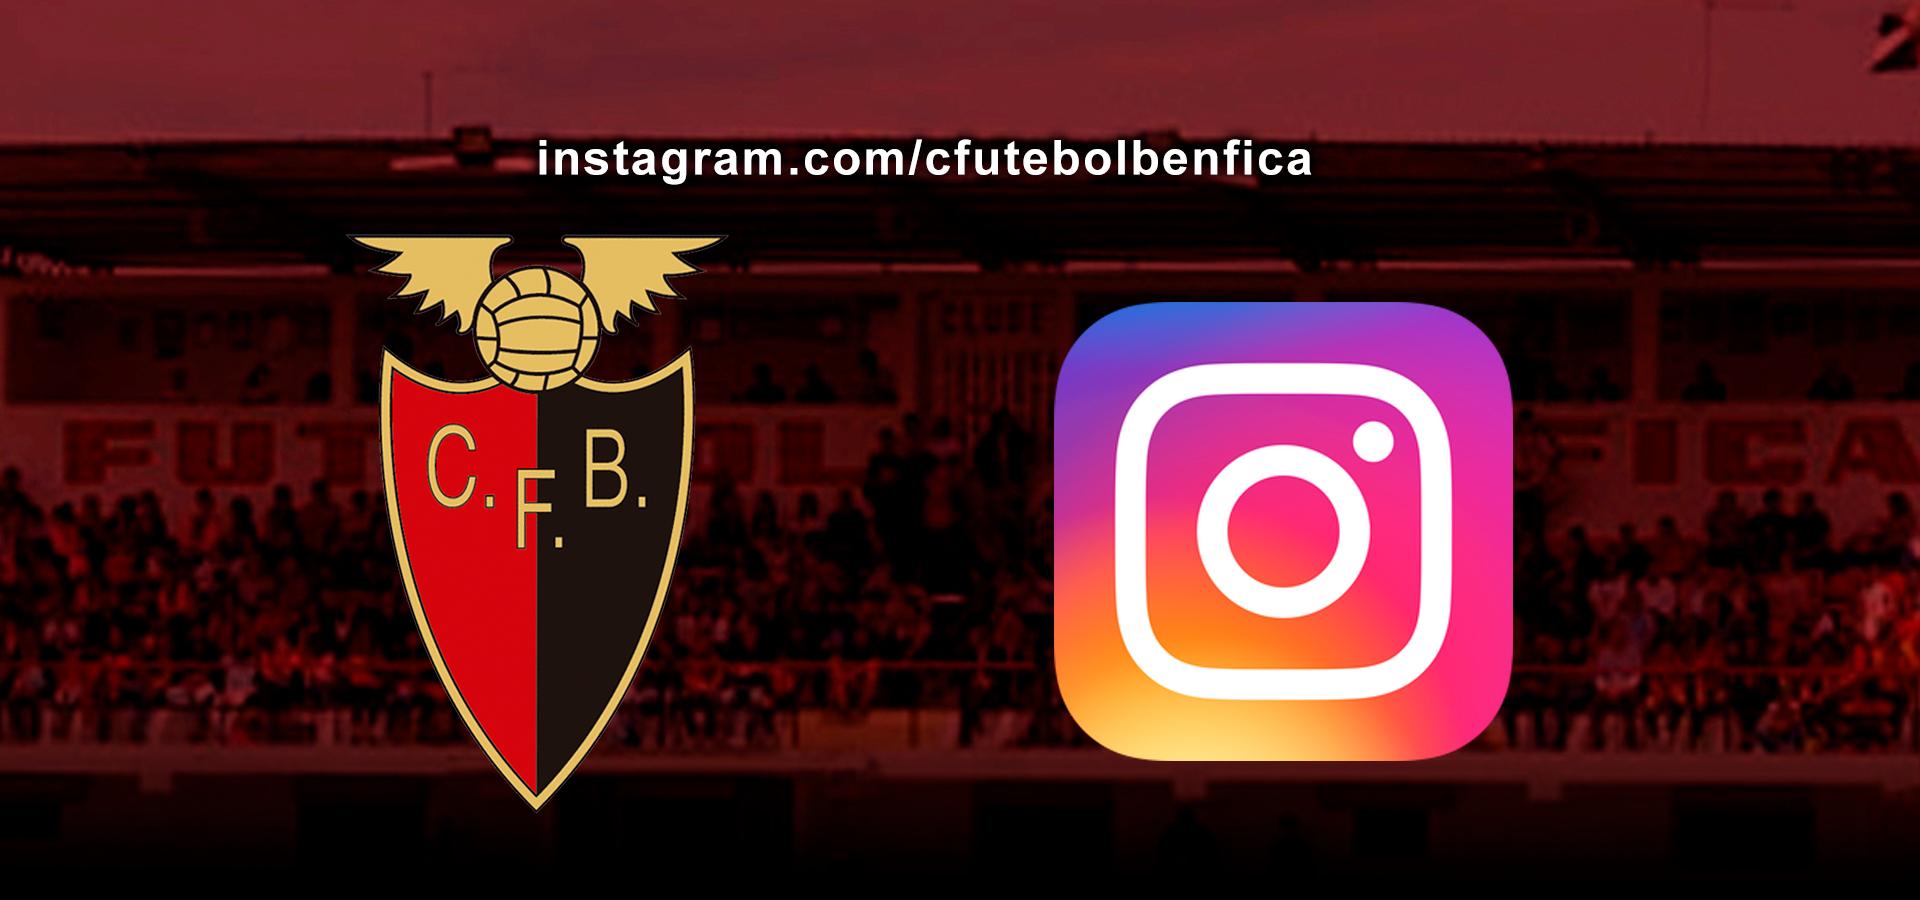 CFB @ Instagram